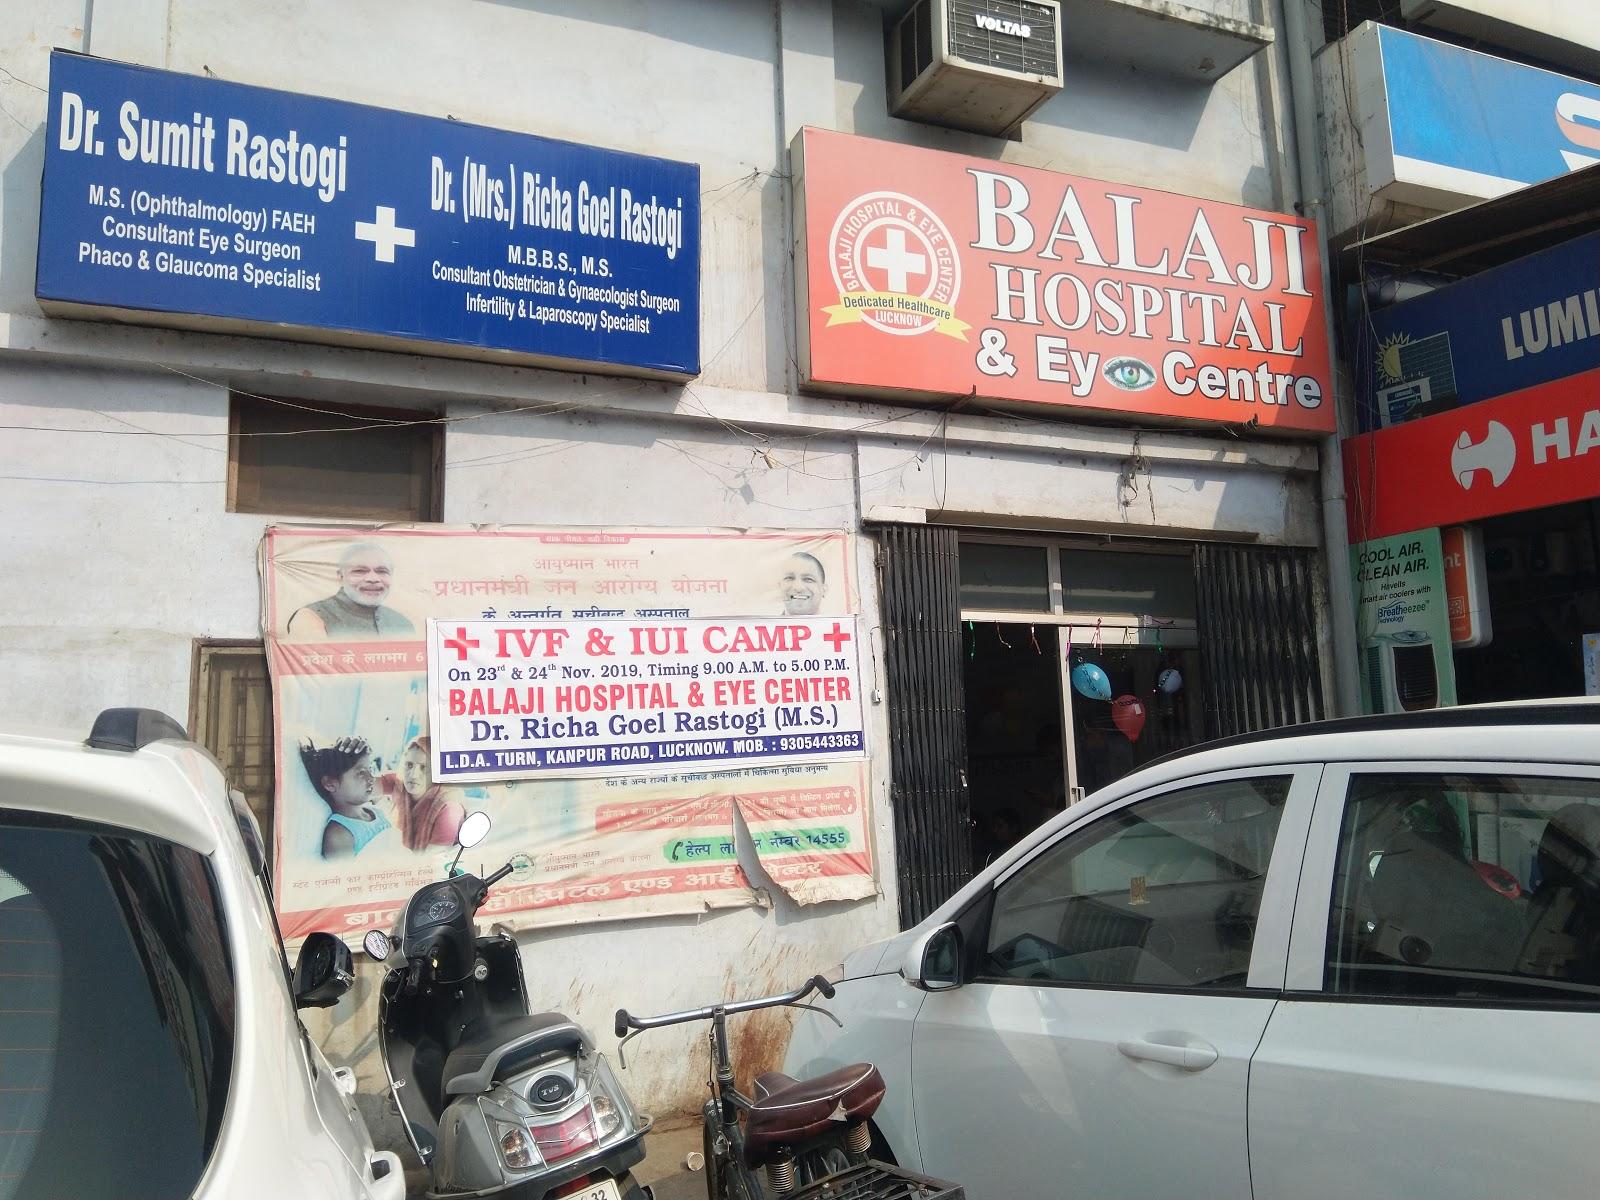 Balaji Hospital & Eye Centre Lucknow Uttar Pradesh